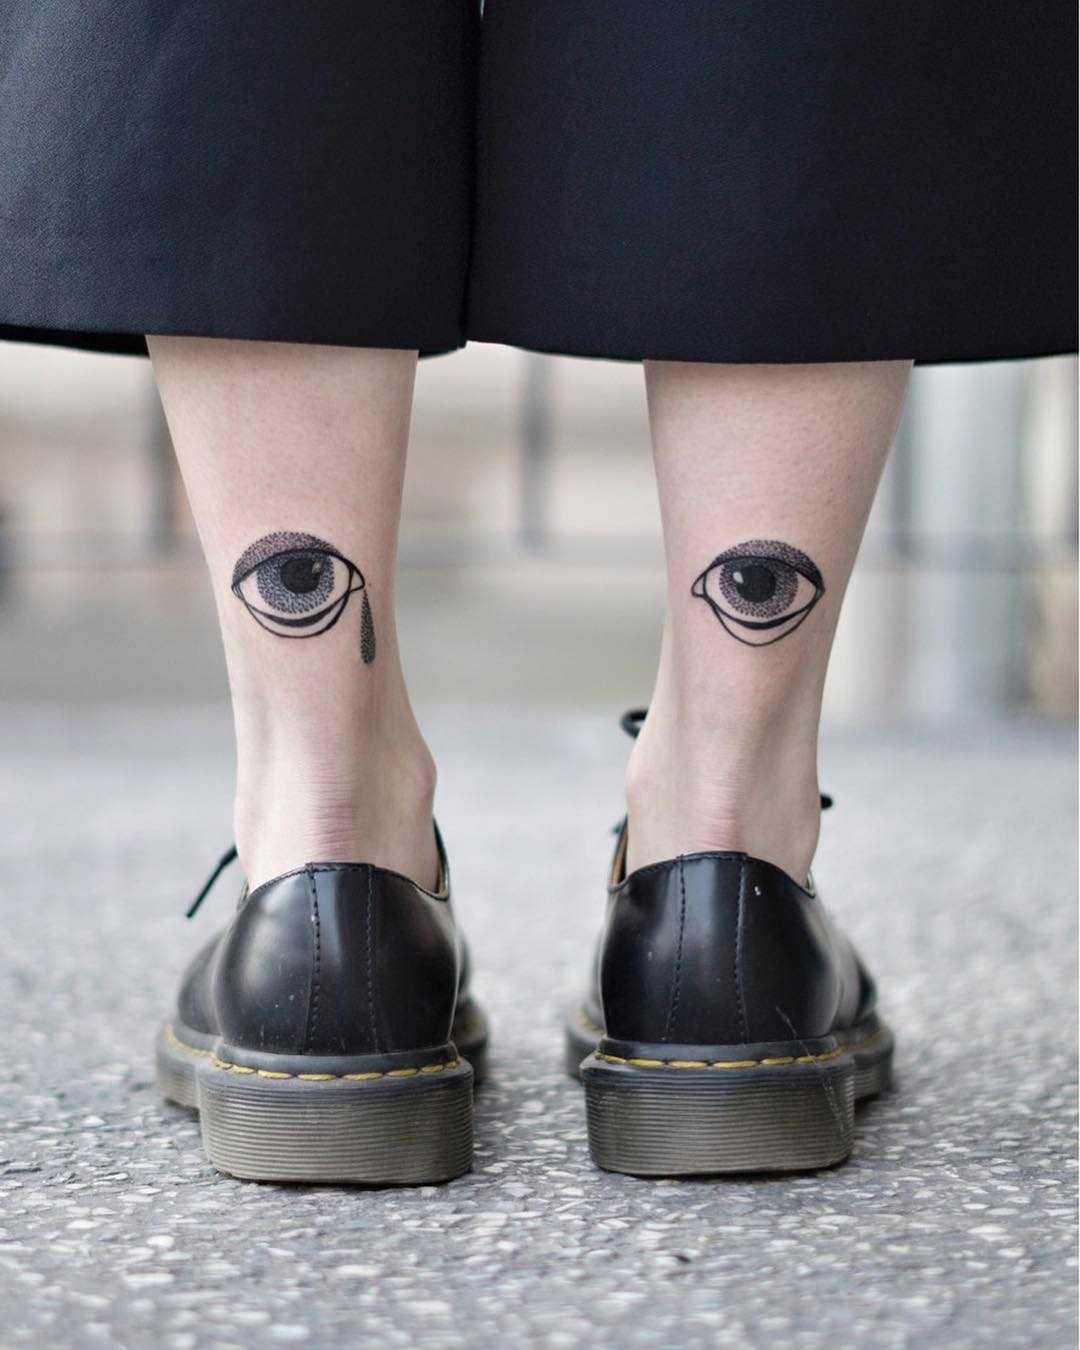 Blackwork eye tattoos by Dżudi Bazgrole